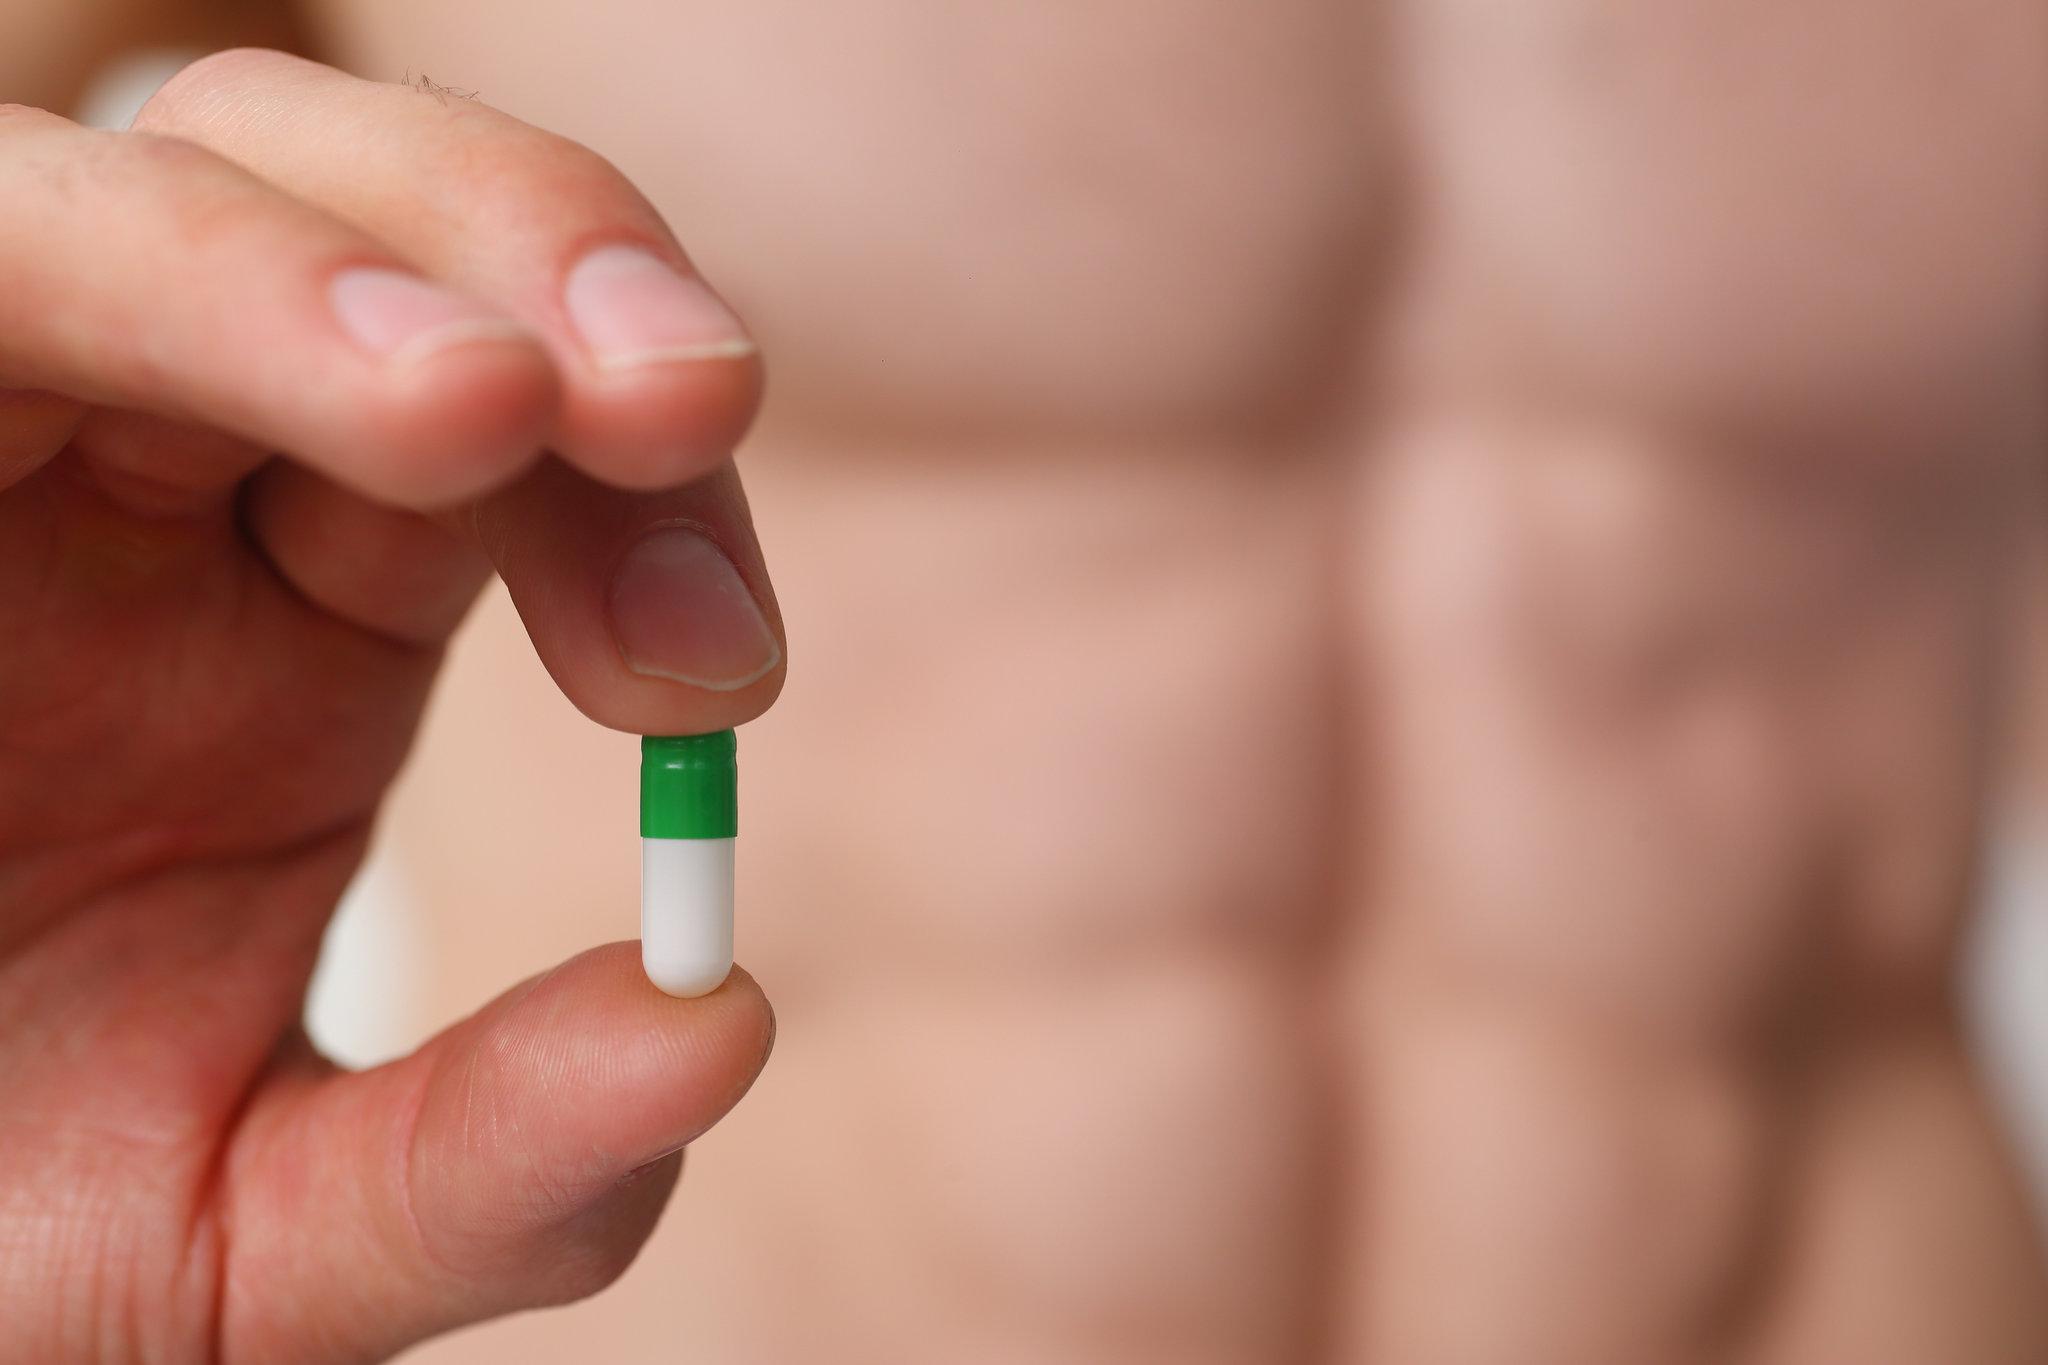 pill-body-superJumbo